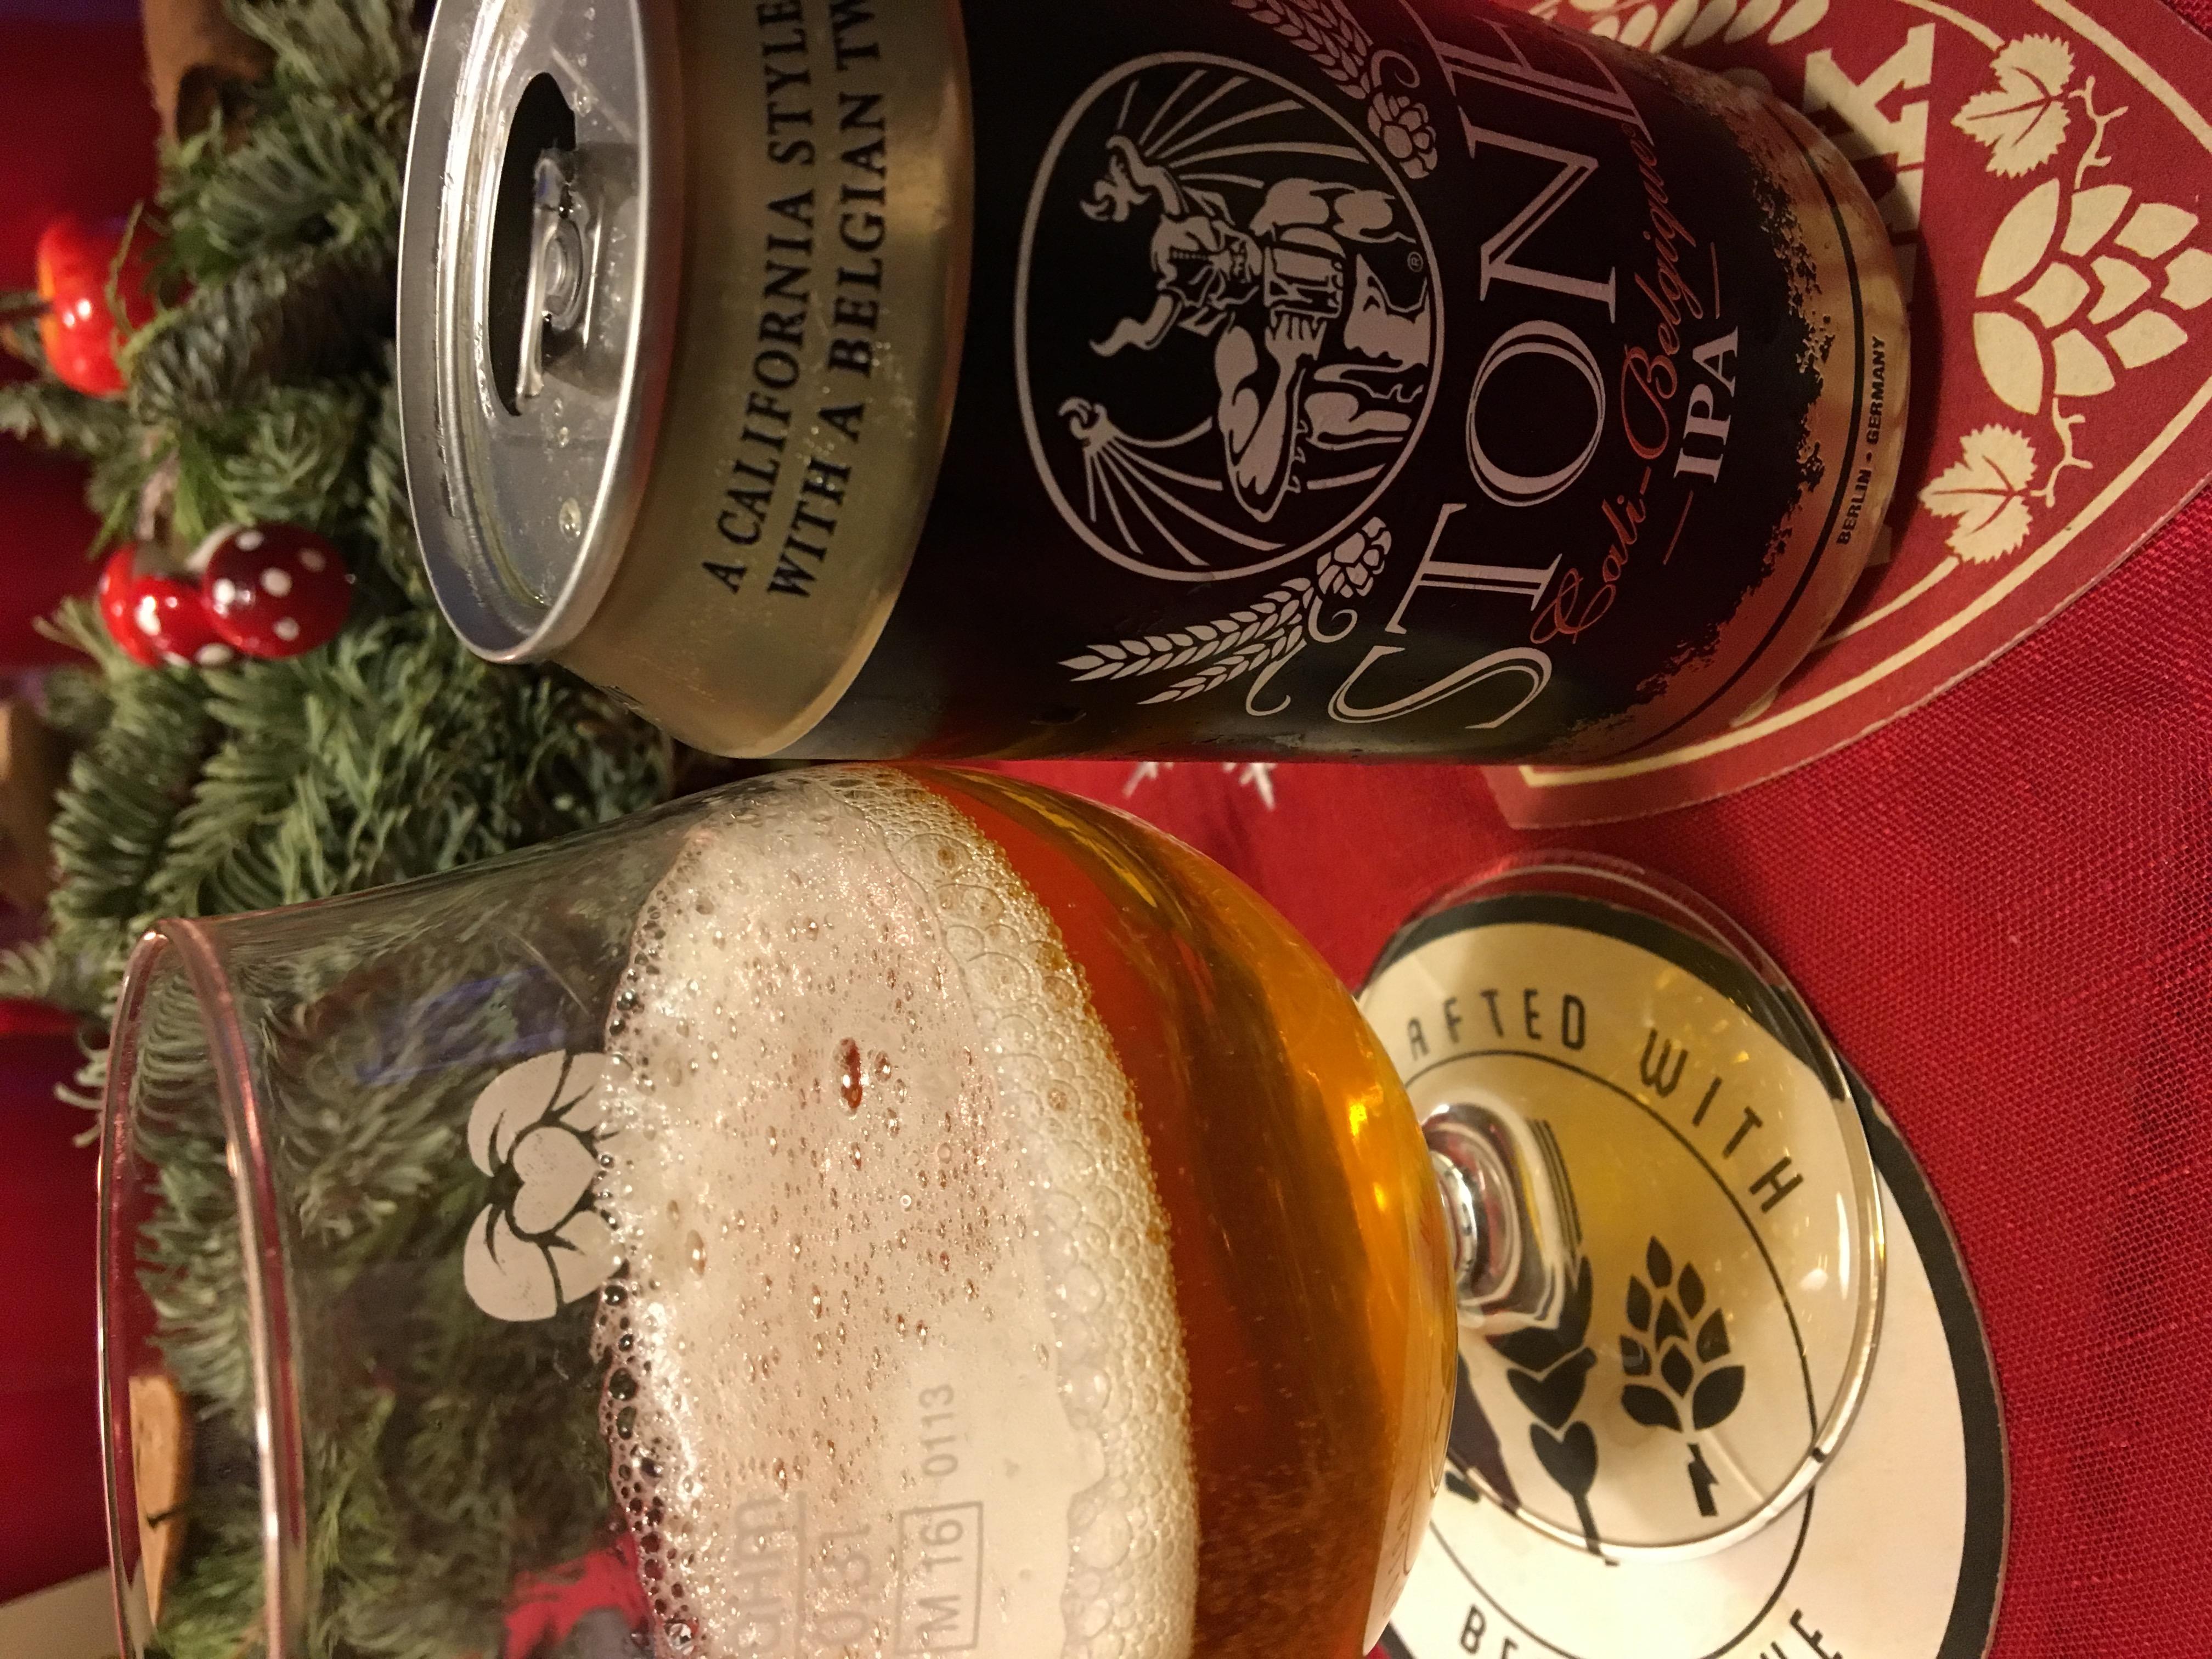 Stone Brewing – Cali-Belgique IPA